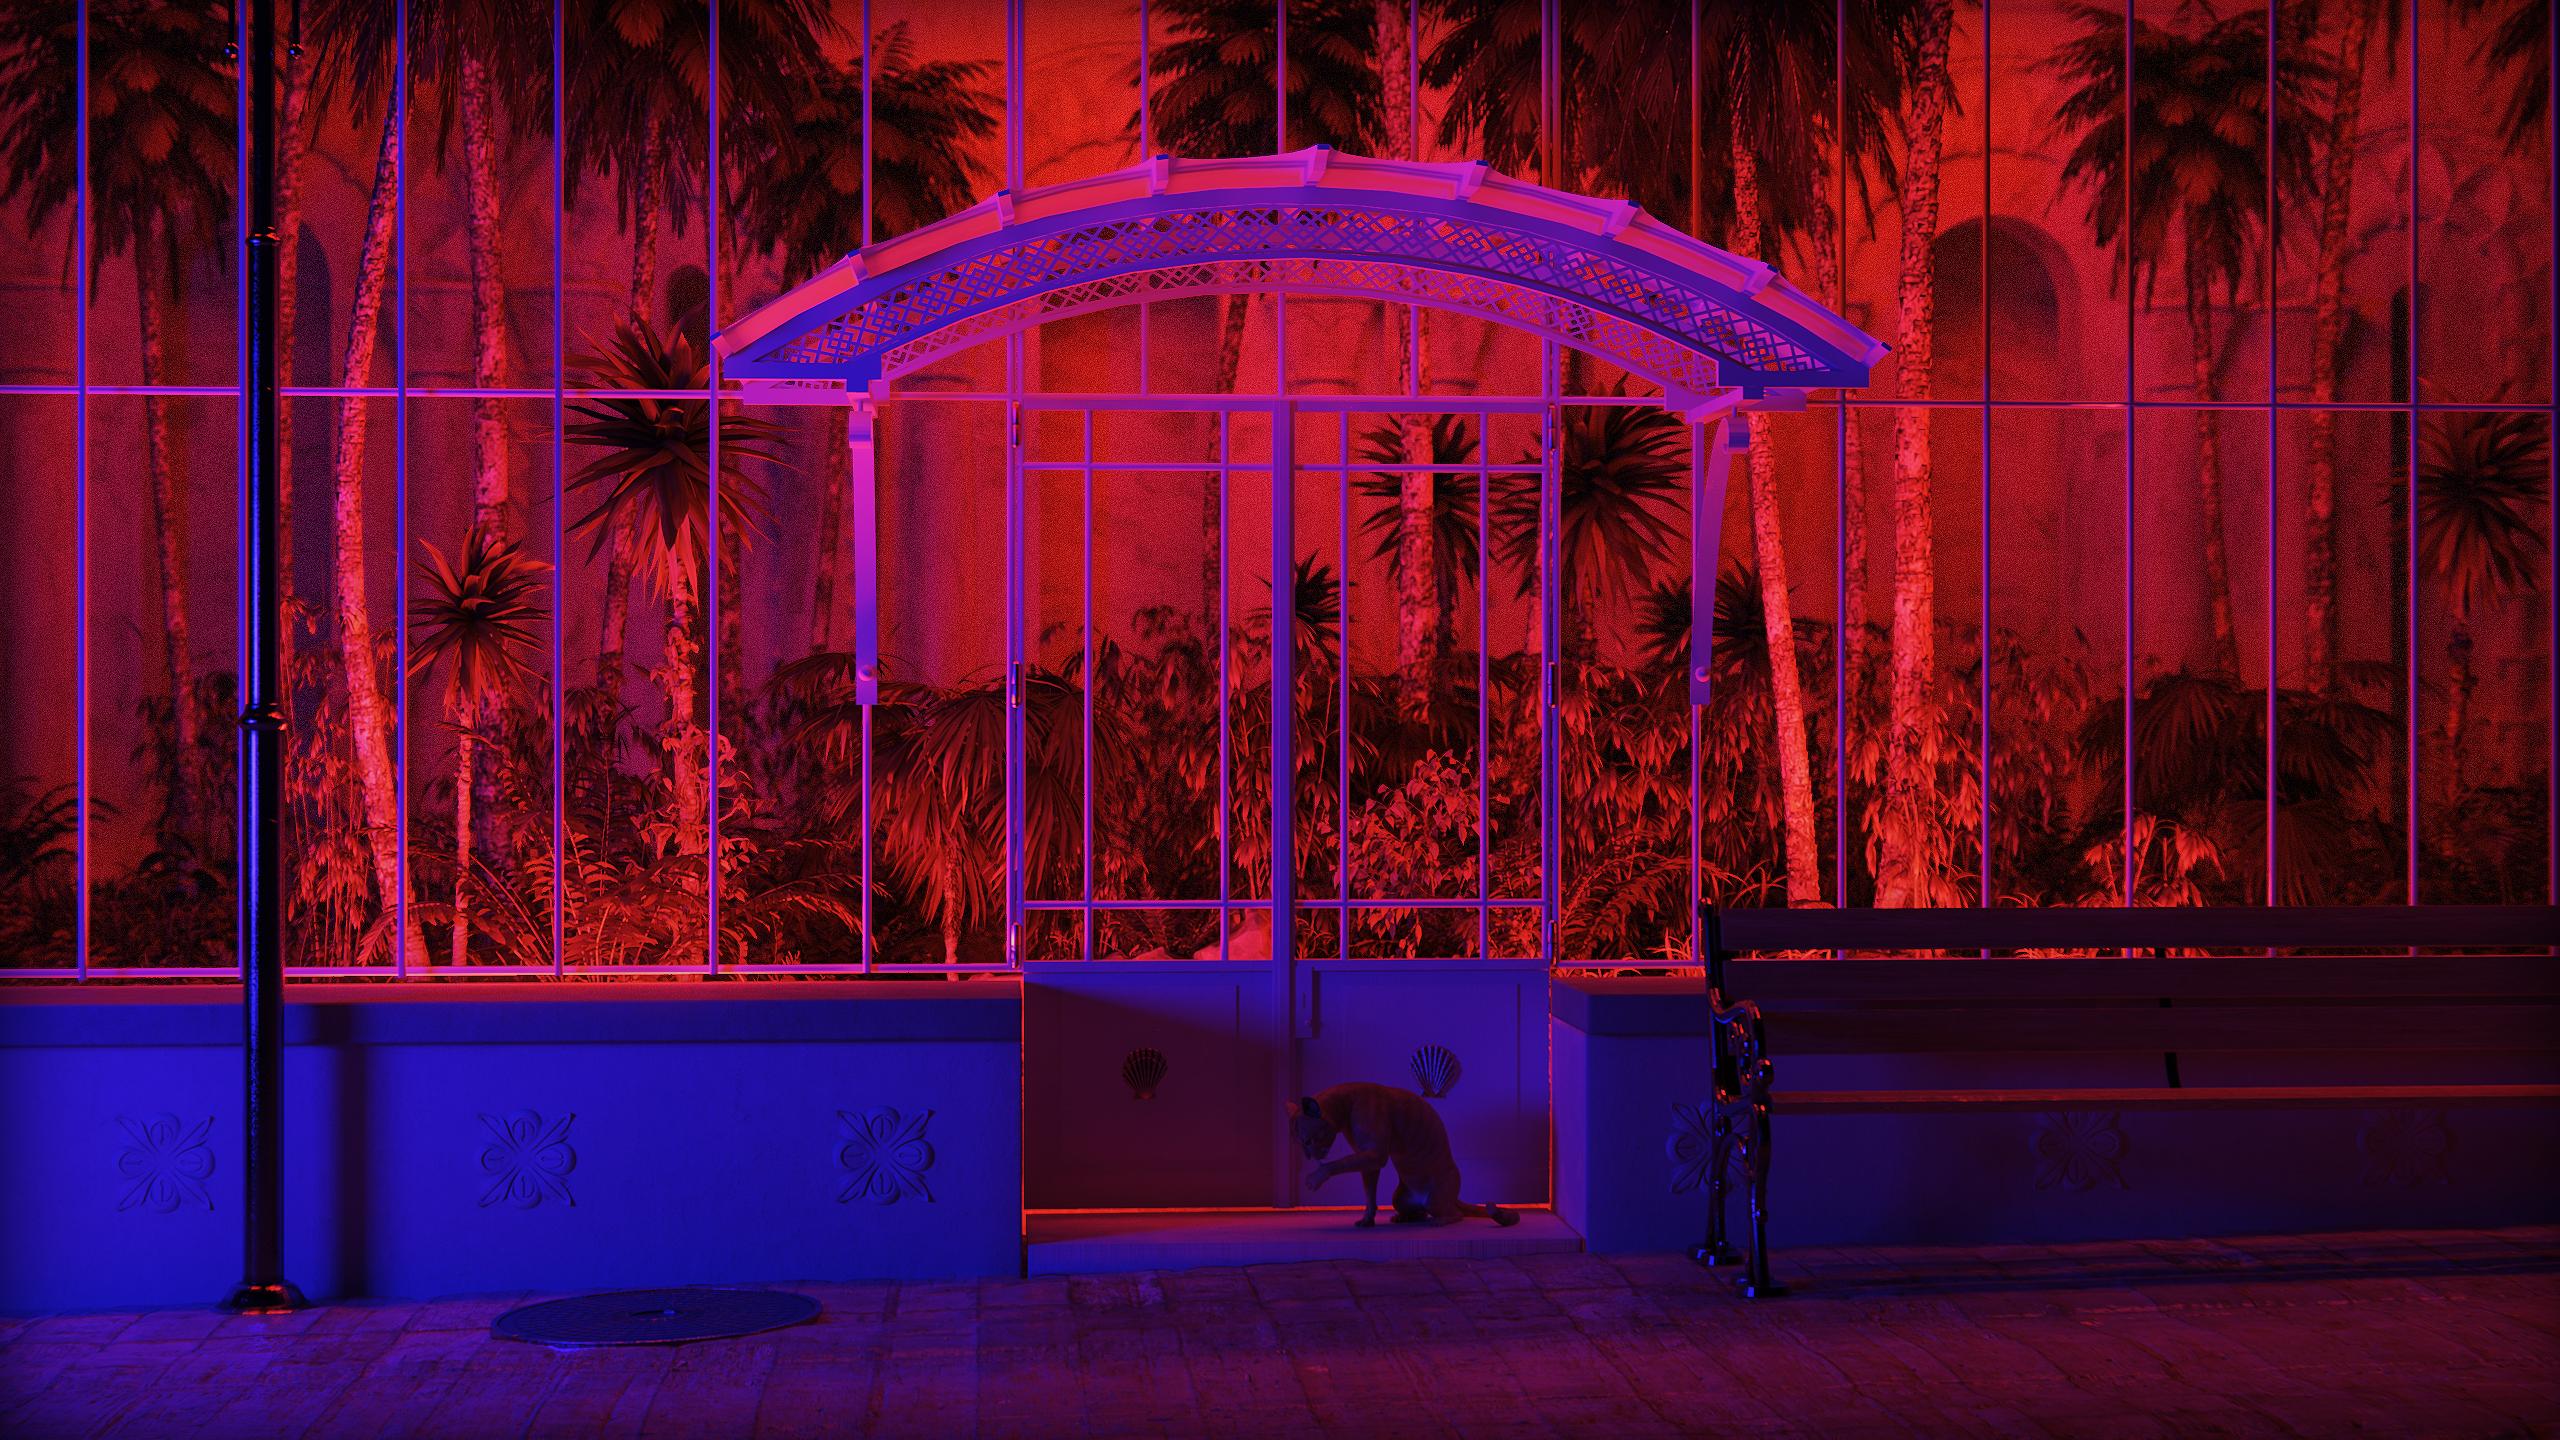 General 2560x1440 3D graphics 3d design CGI digital art architecture park bench neon neon lights plants palm trees yucca bamboo fence cobblestone